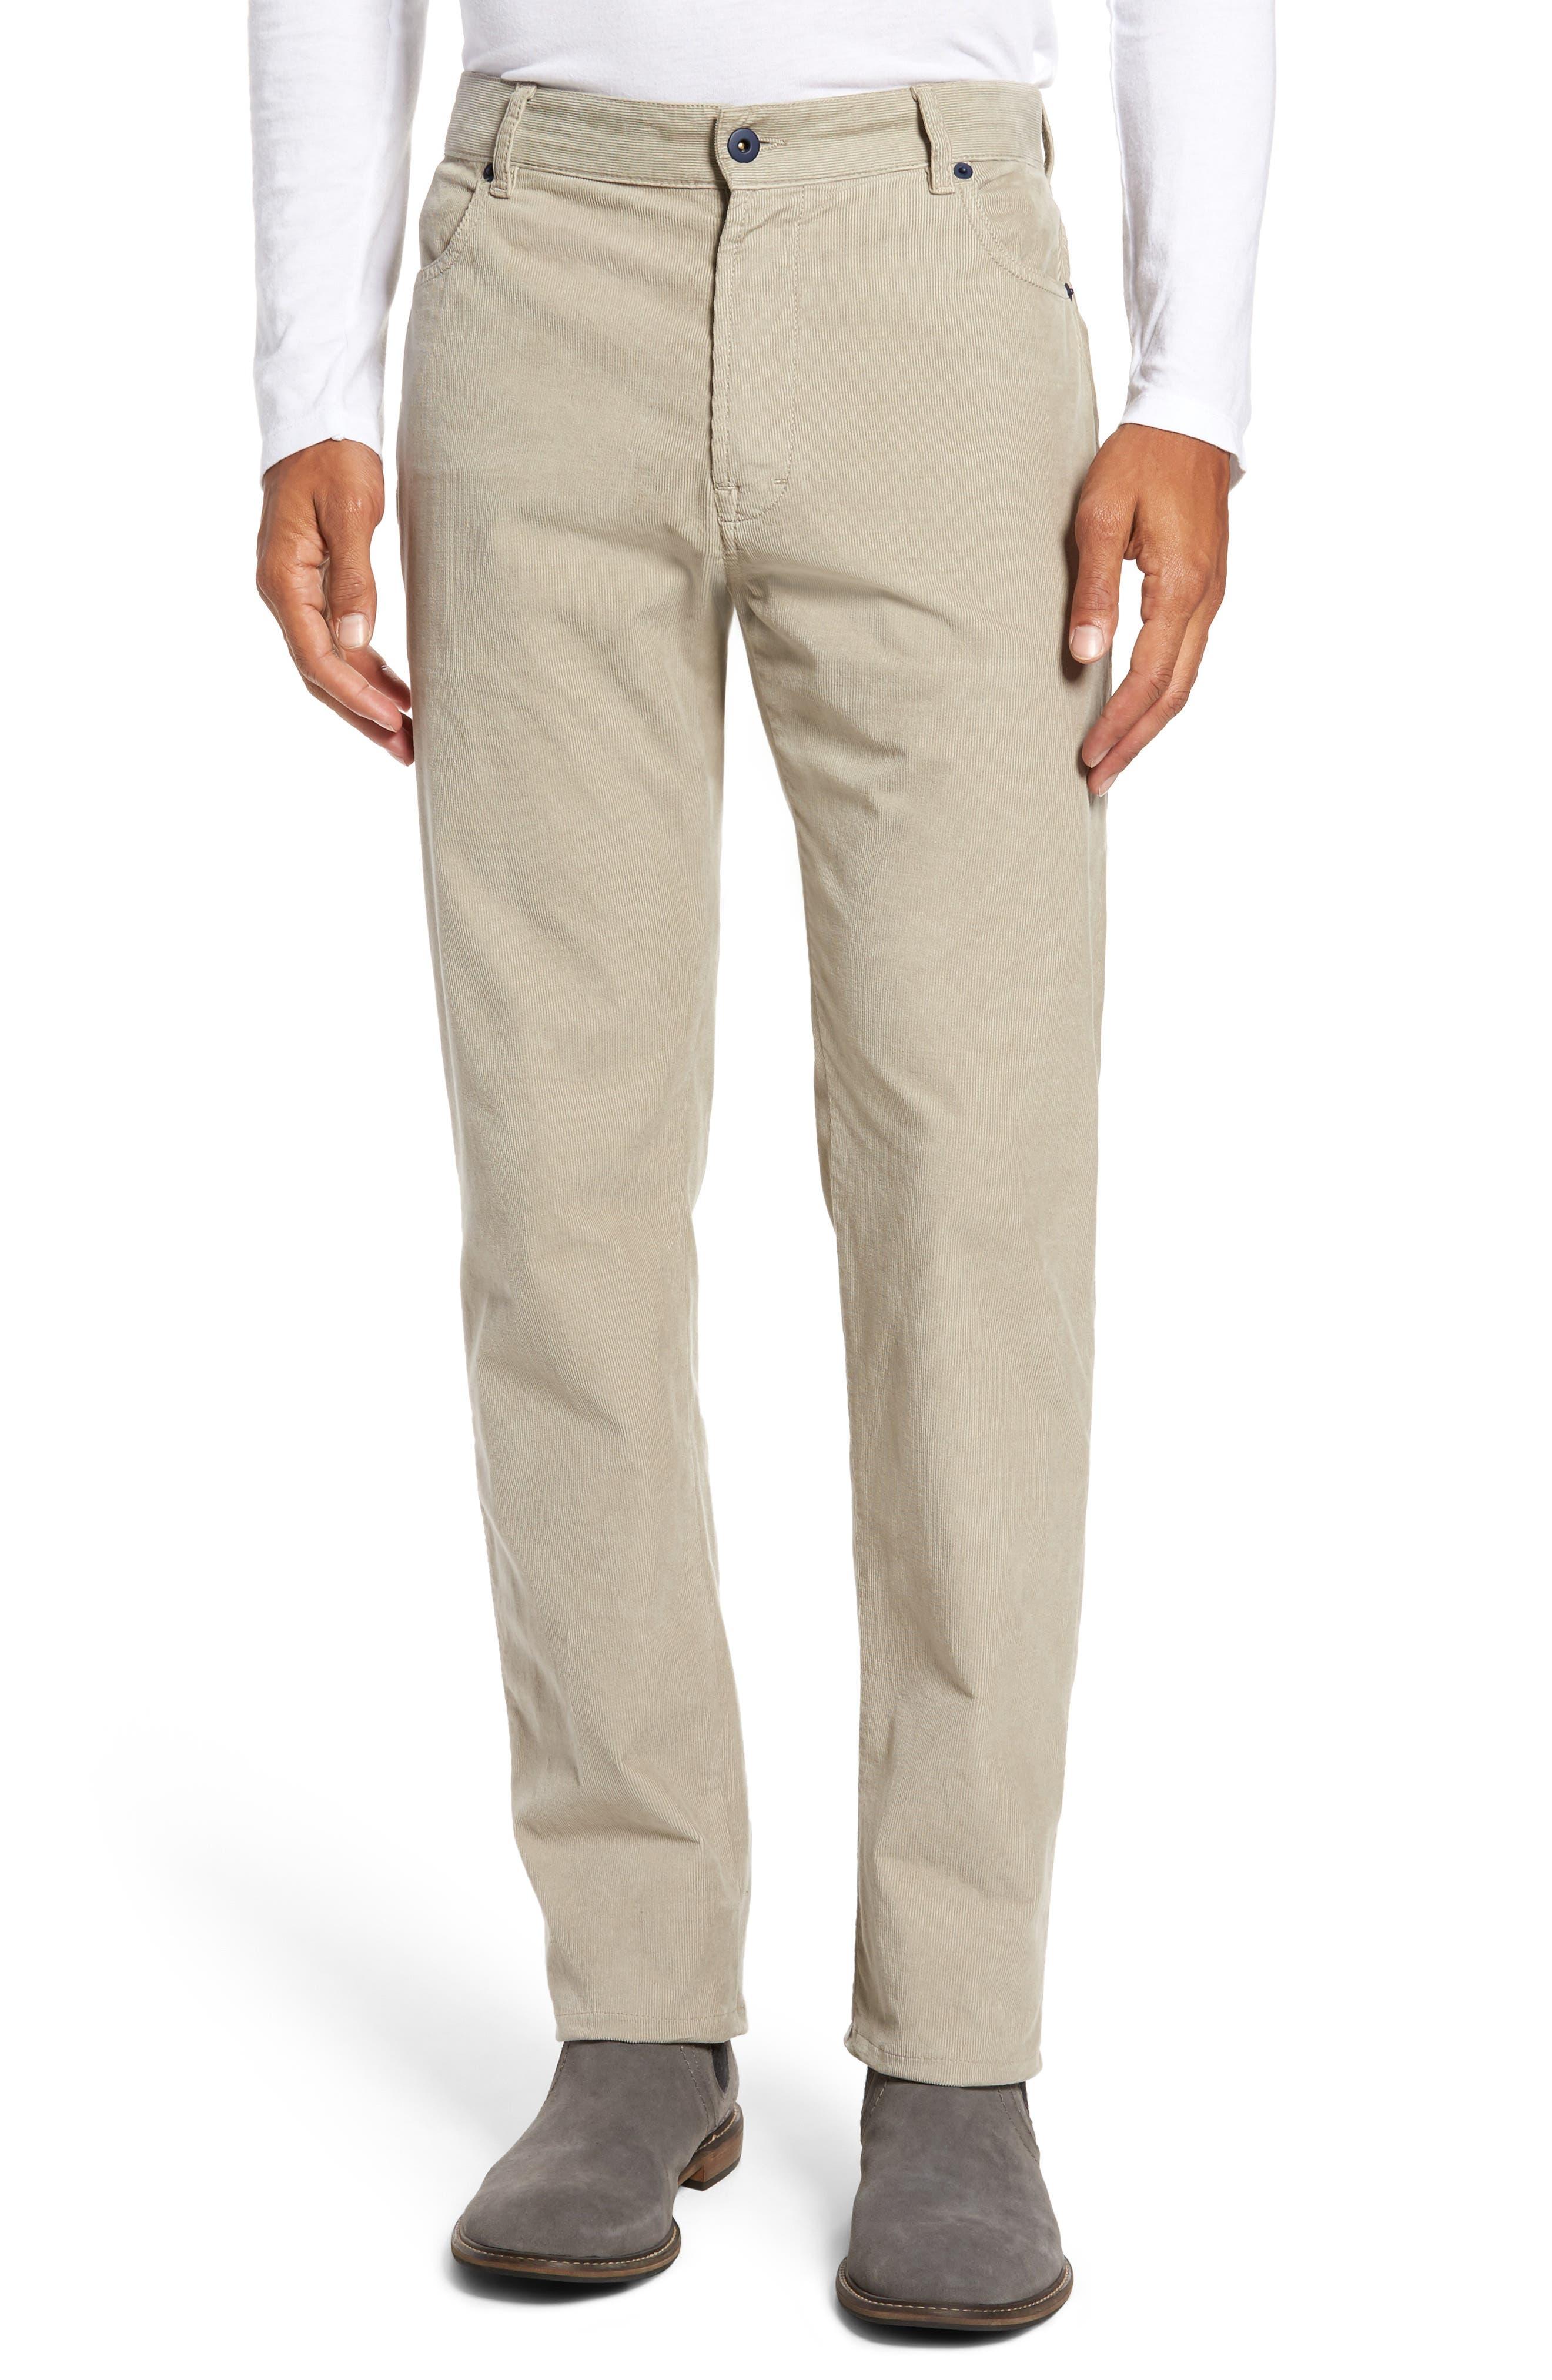 Redonda Stretch Corduroy Trousers,                             Main thumbnail 1, color,                             252